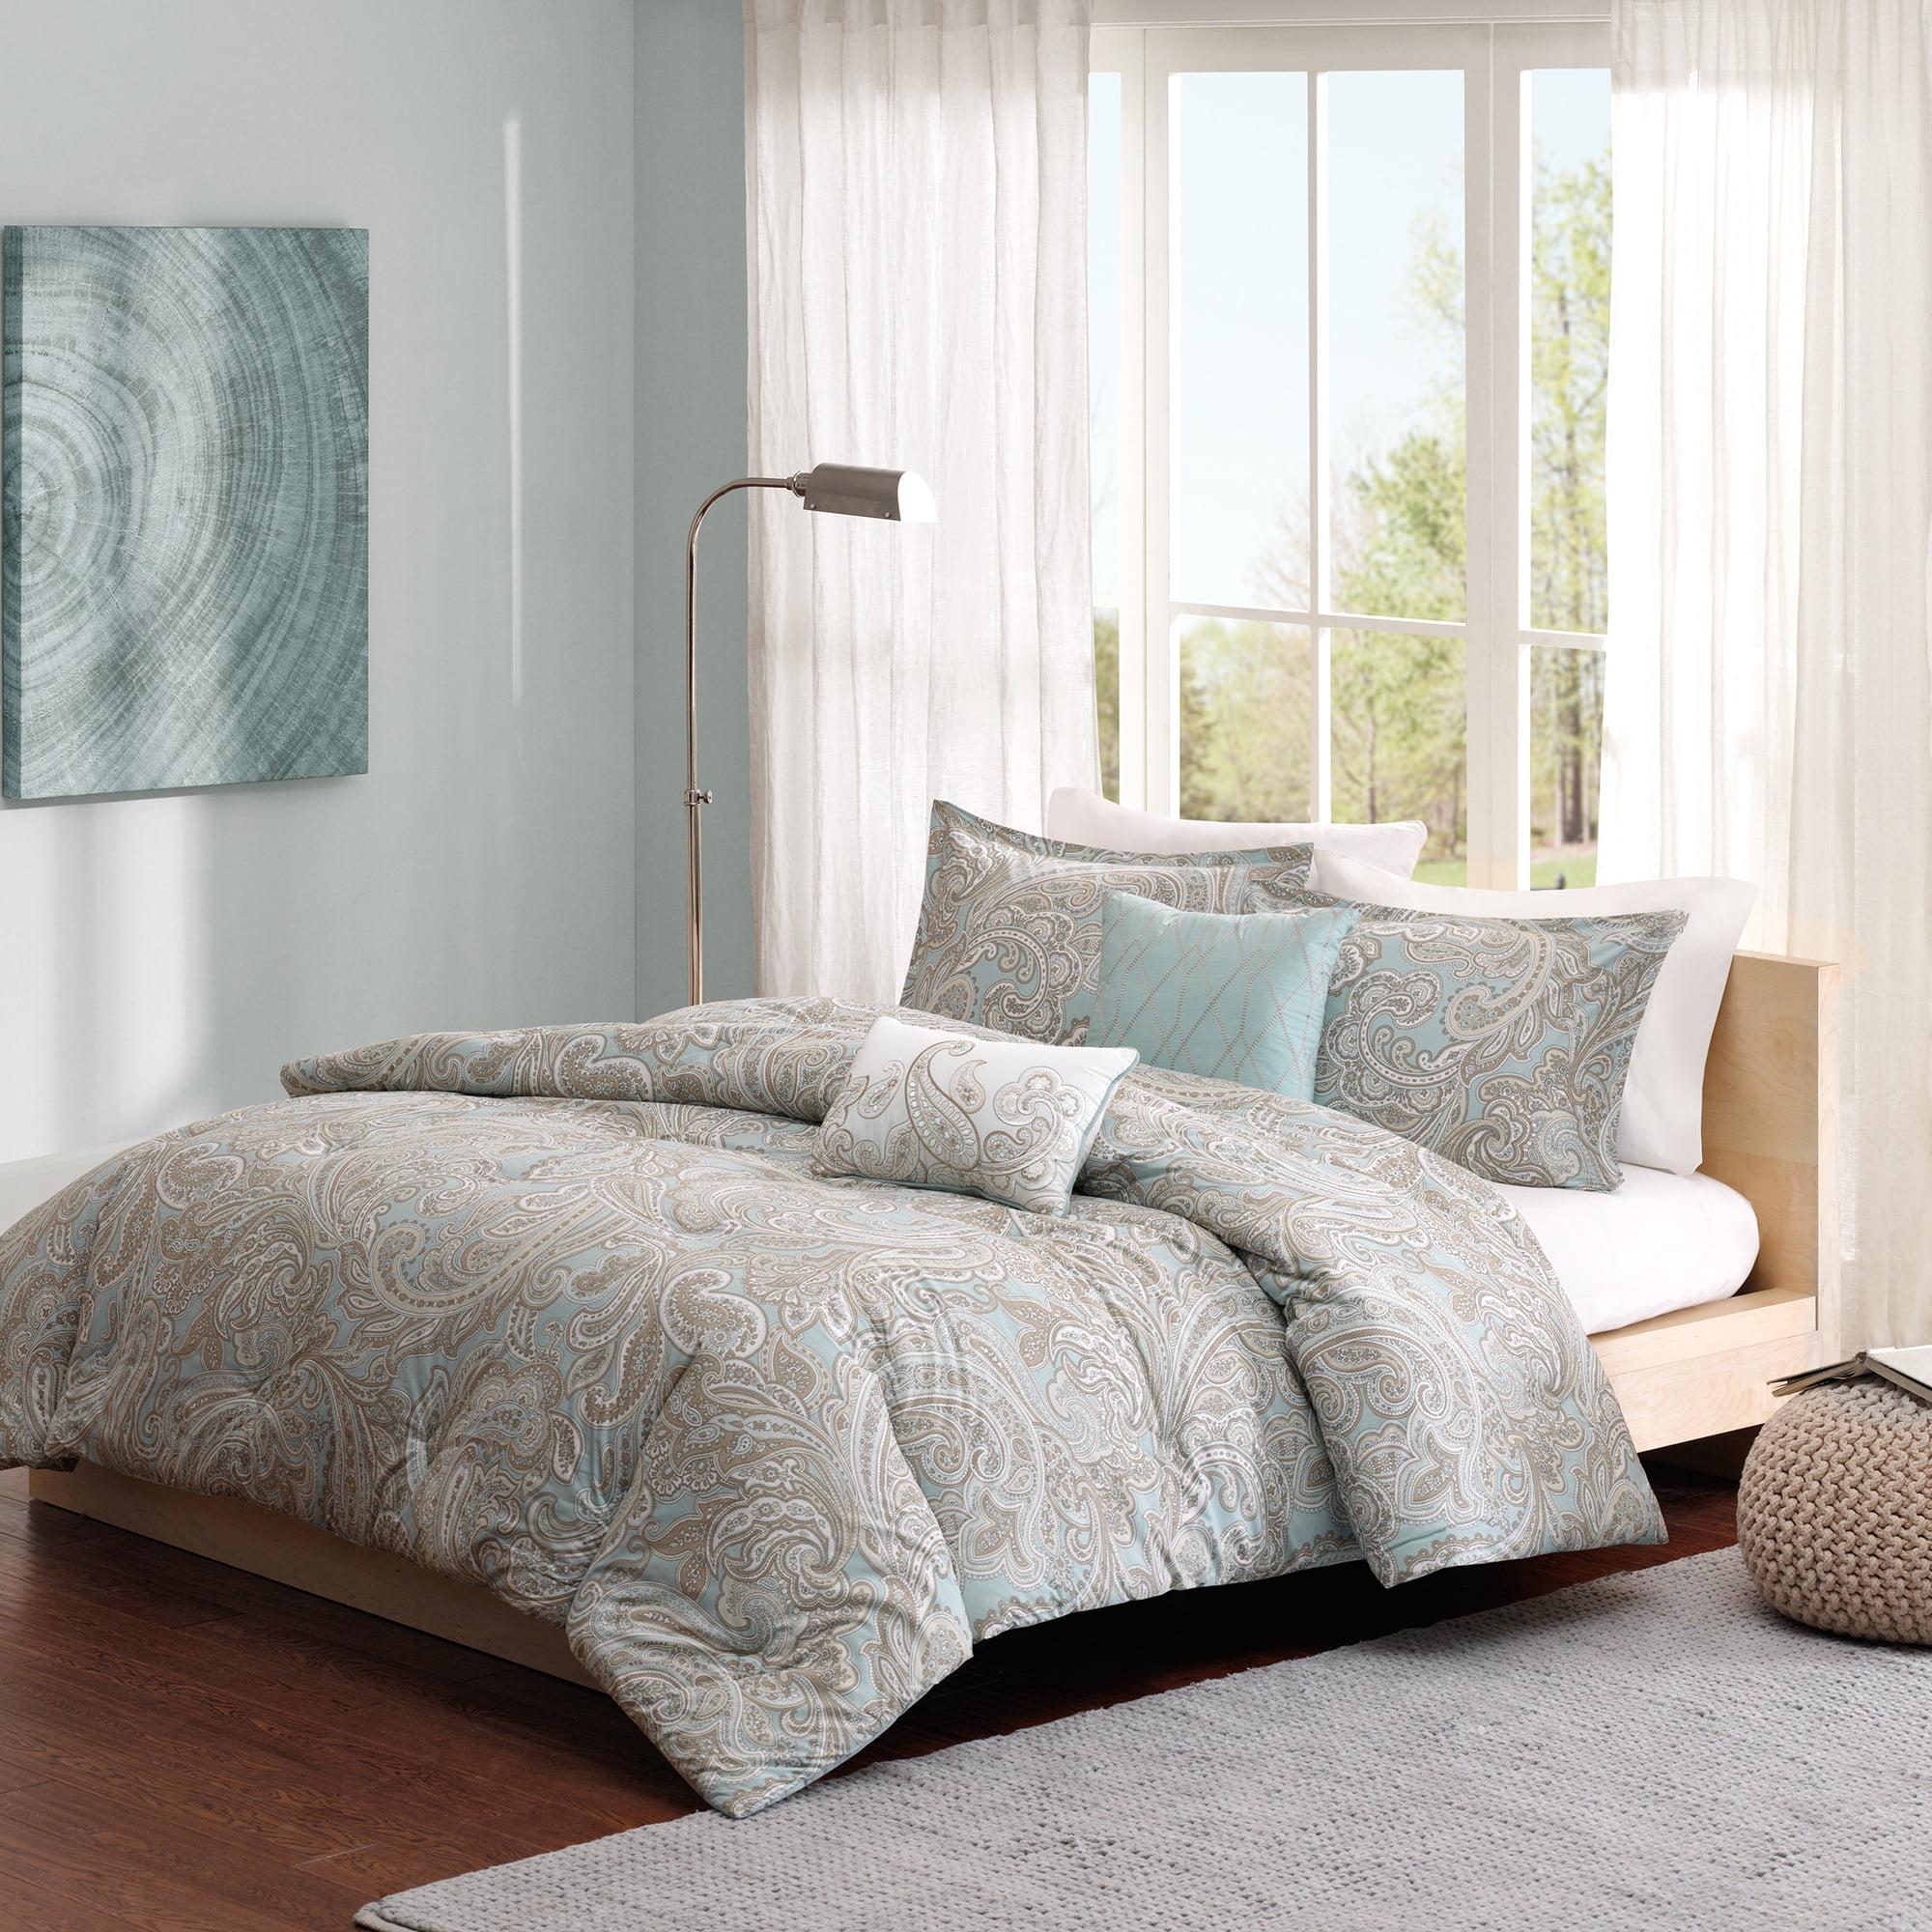 Home Essence Dierdre 5 Piece Cotton Comforter Set